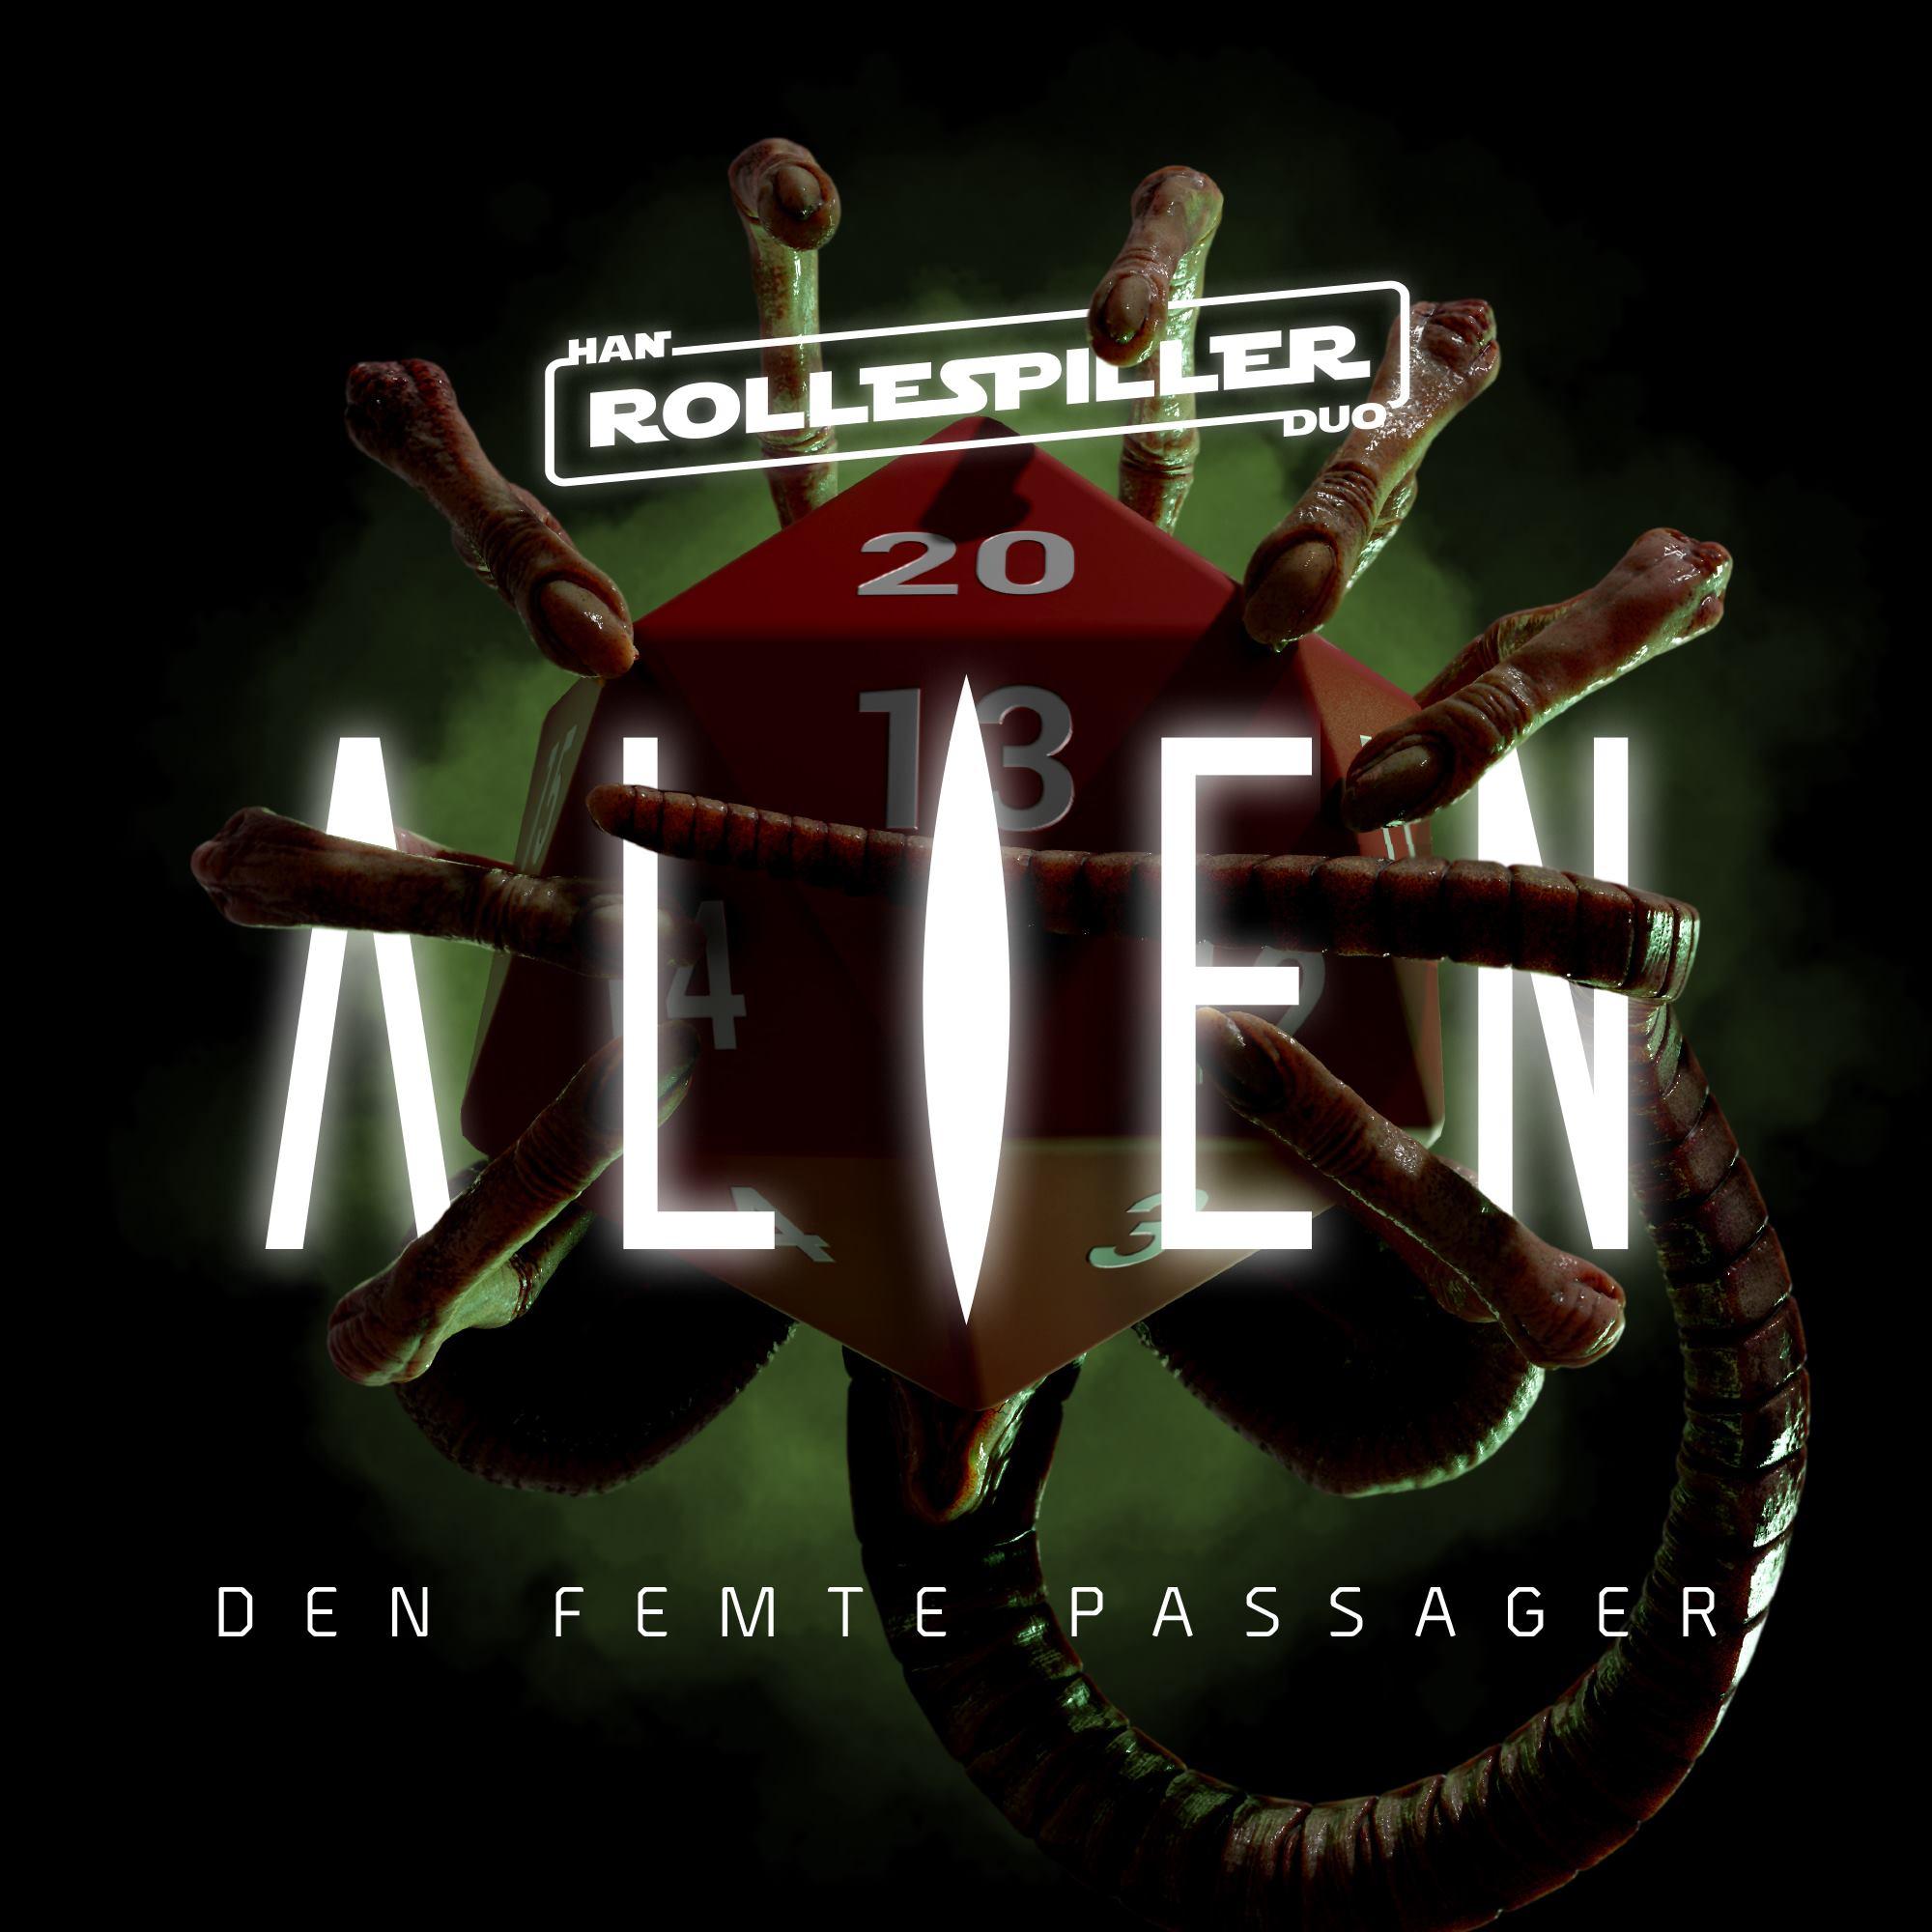 Han Duo Rollespiller: Alien 4:4